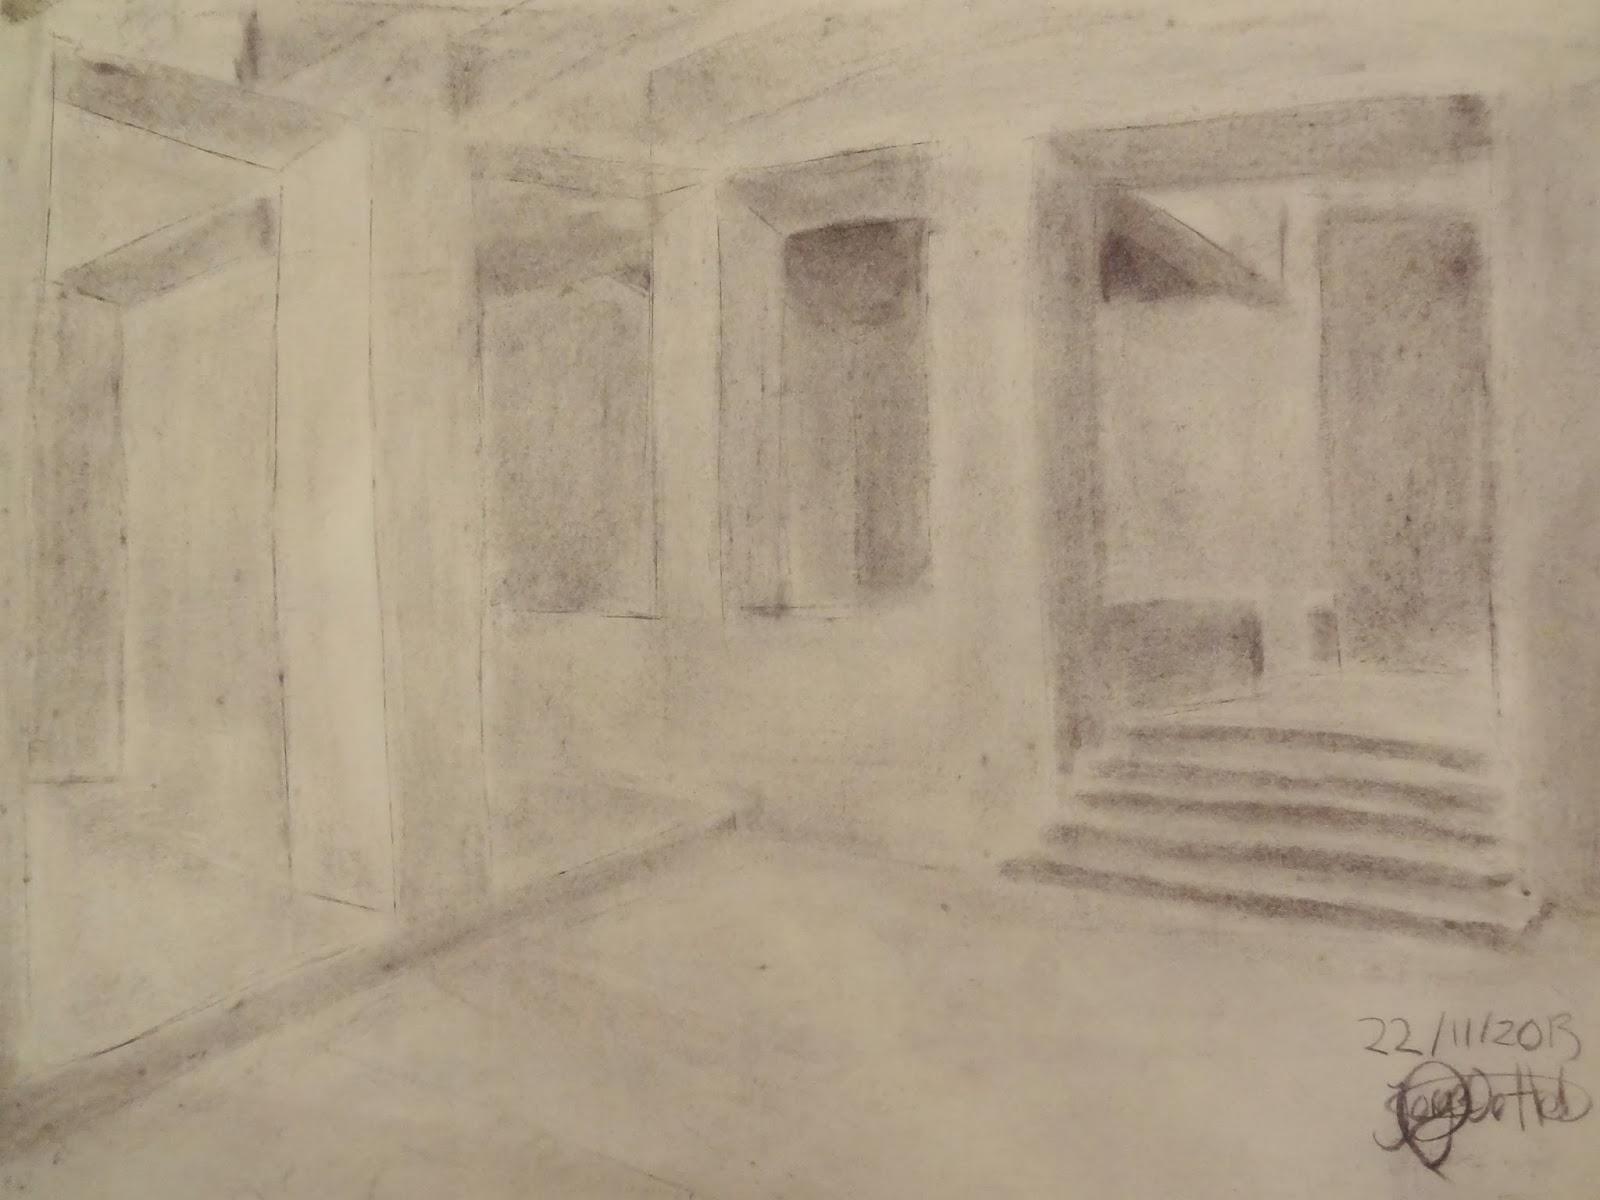 DAI ETSAM 2013: Análisis Espacio Aula Museo: Dibujo Final